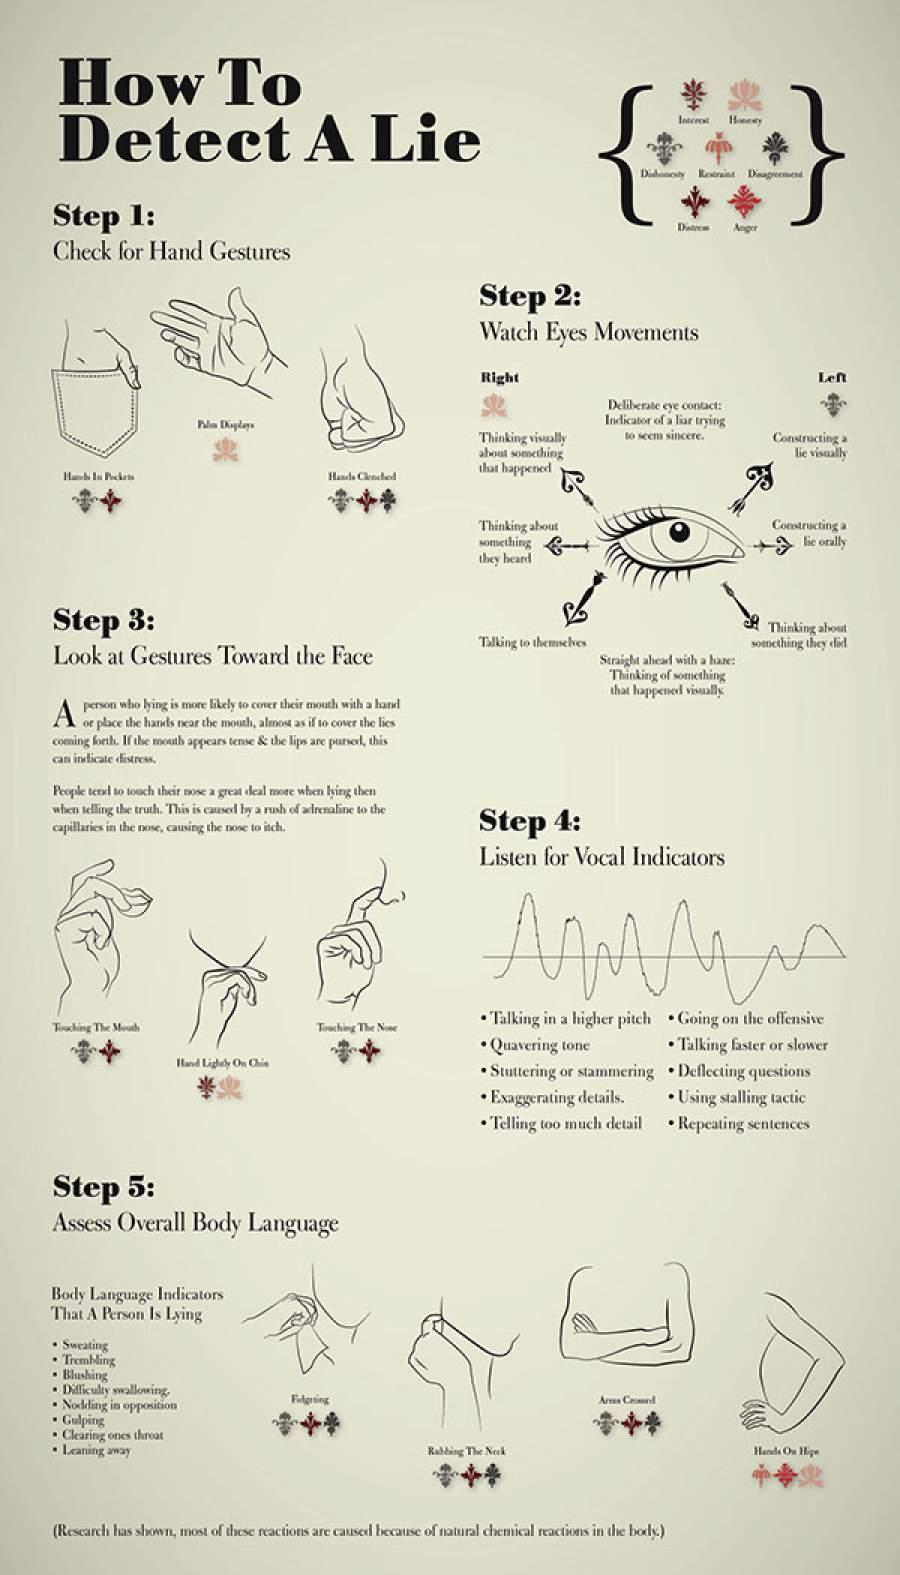 Infografik zum Thema Luegner entlarven